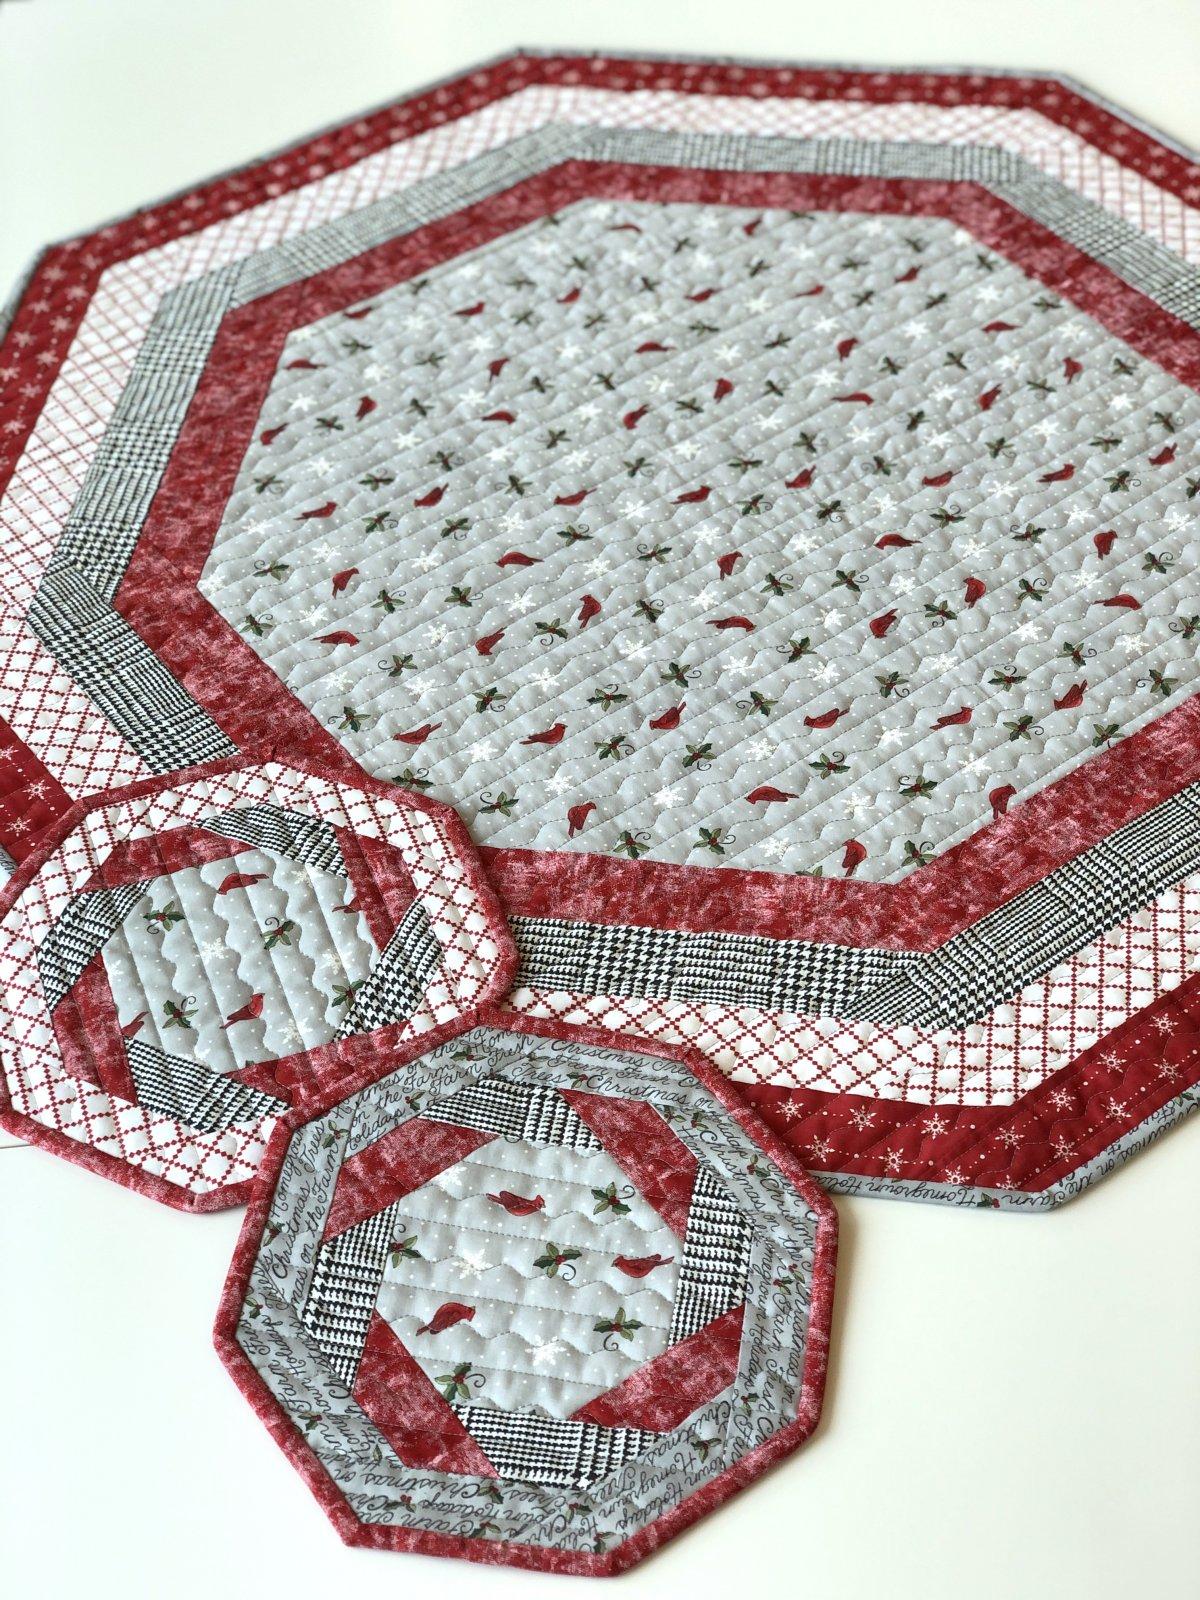 Centerpiece Tablemat - Homegrown Holiday Bundle